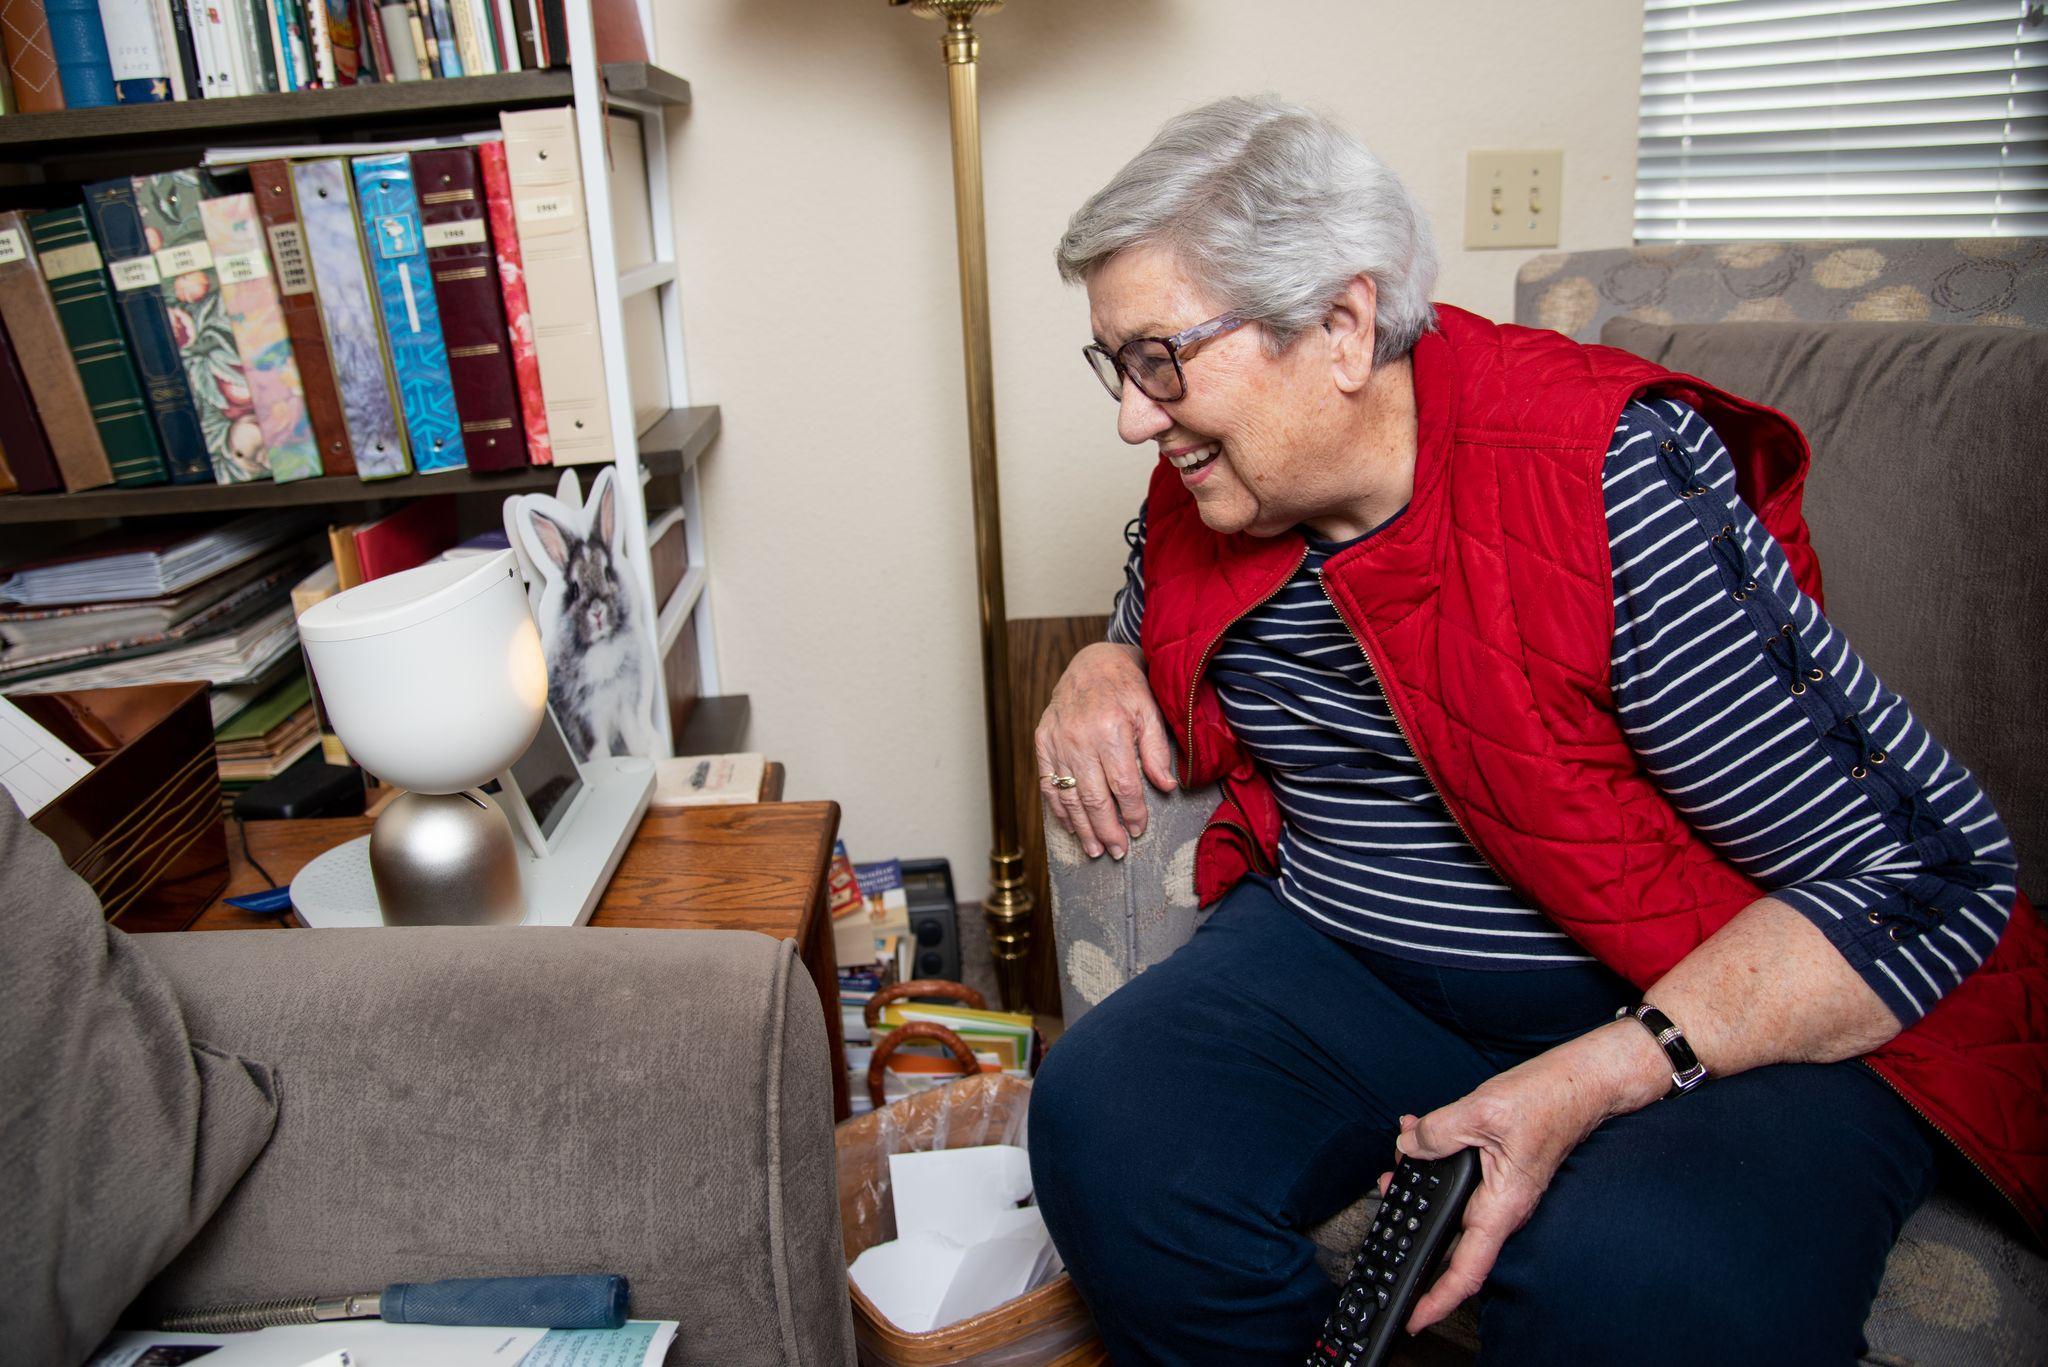 older adult woman using ElliQ